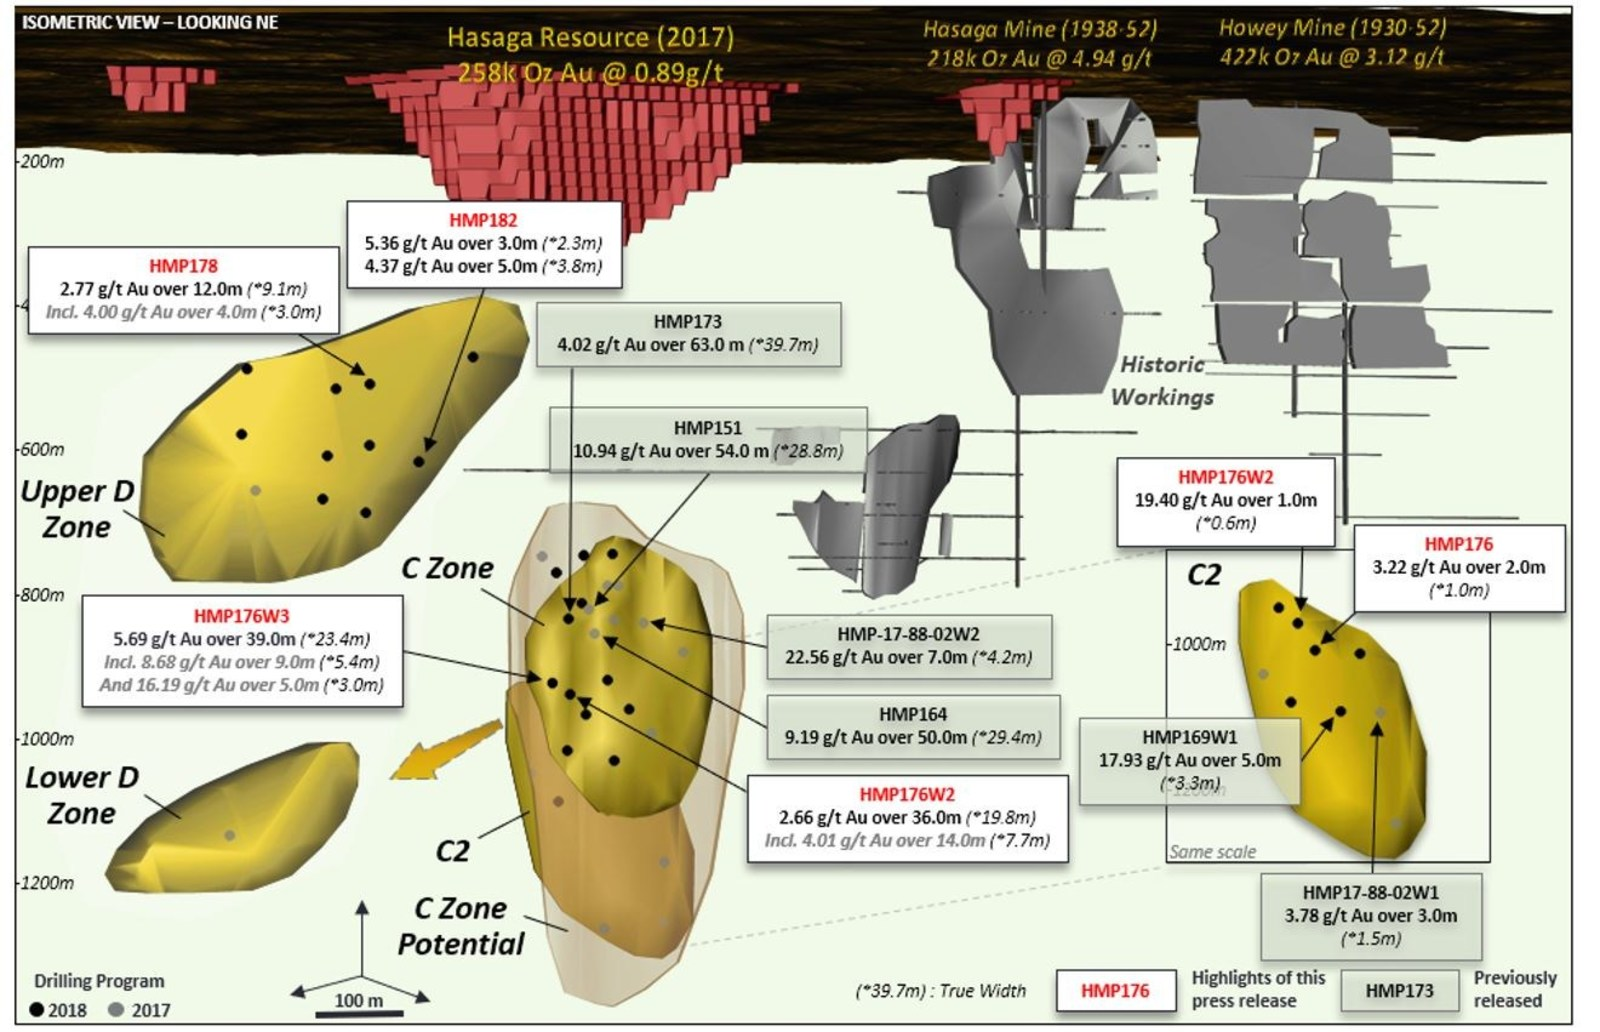 Figure 1: Longitudinal section looking west of the Hasaga Trend exploration program